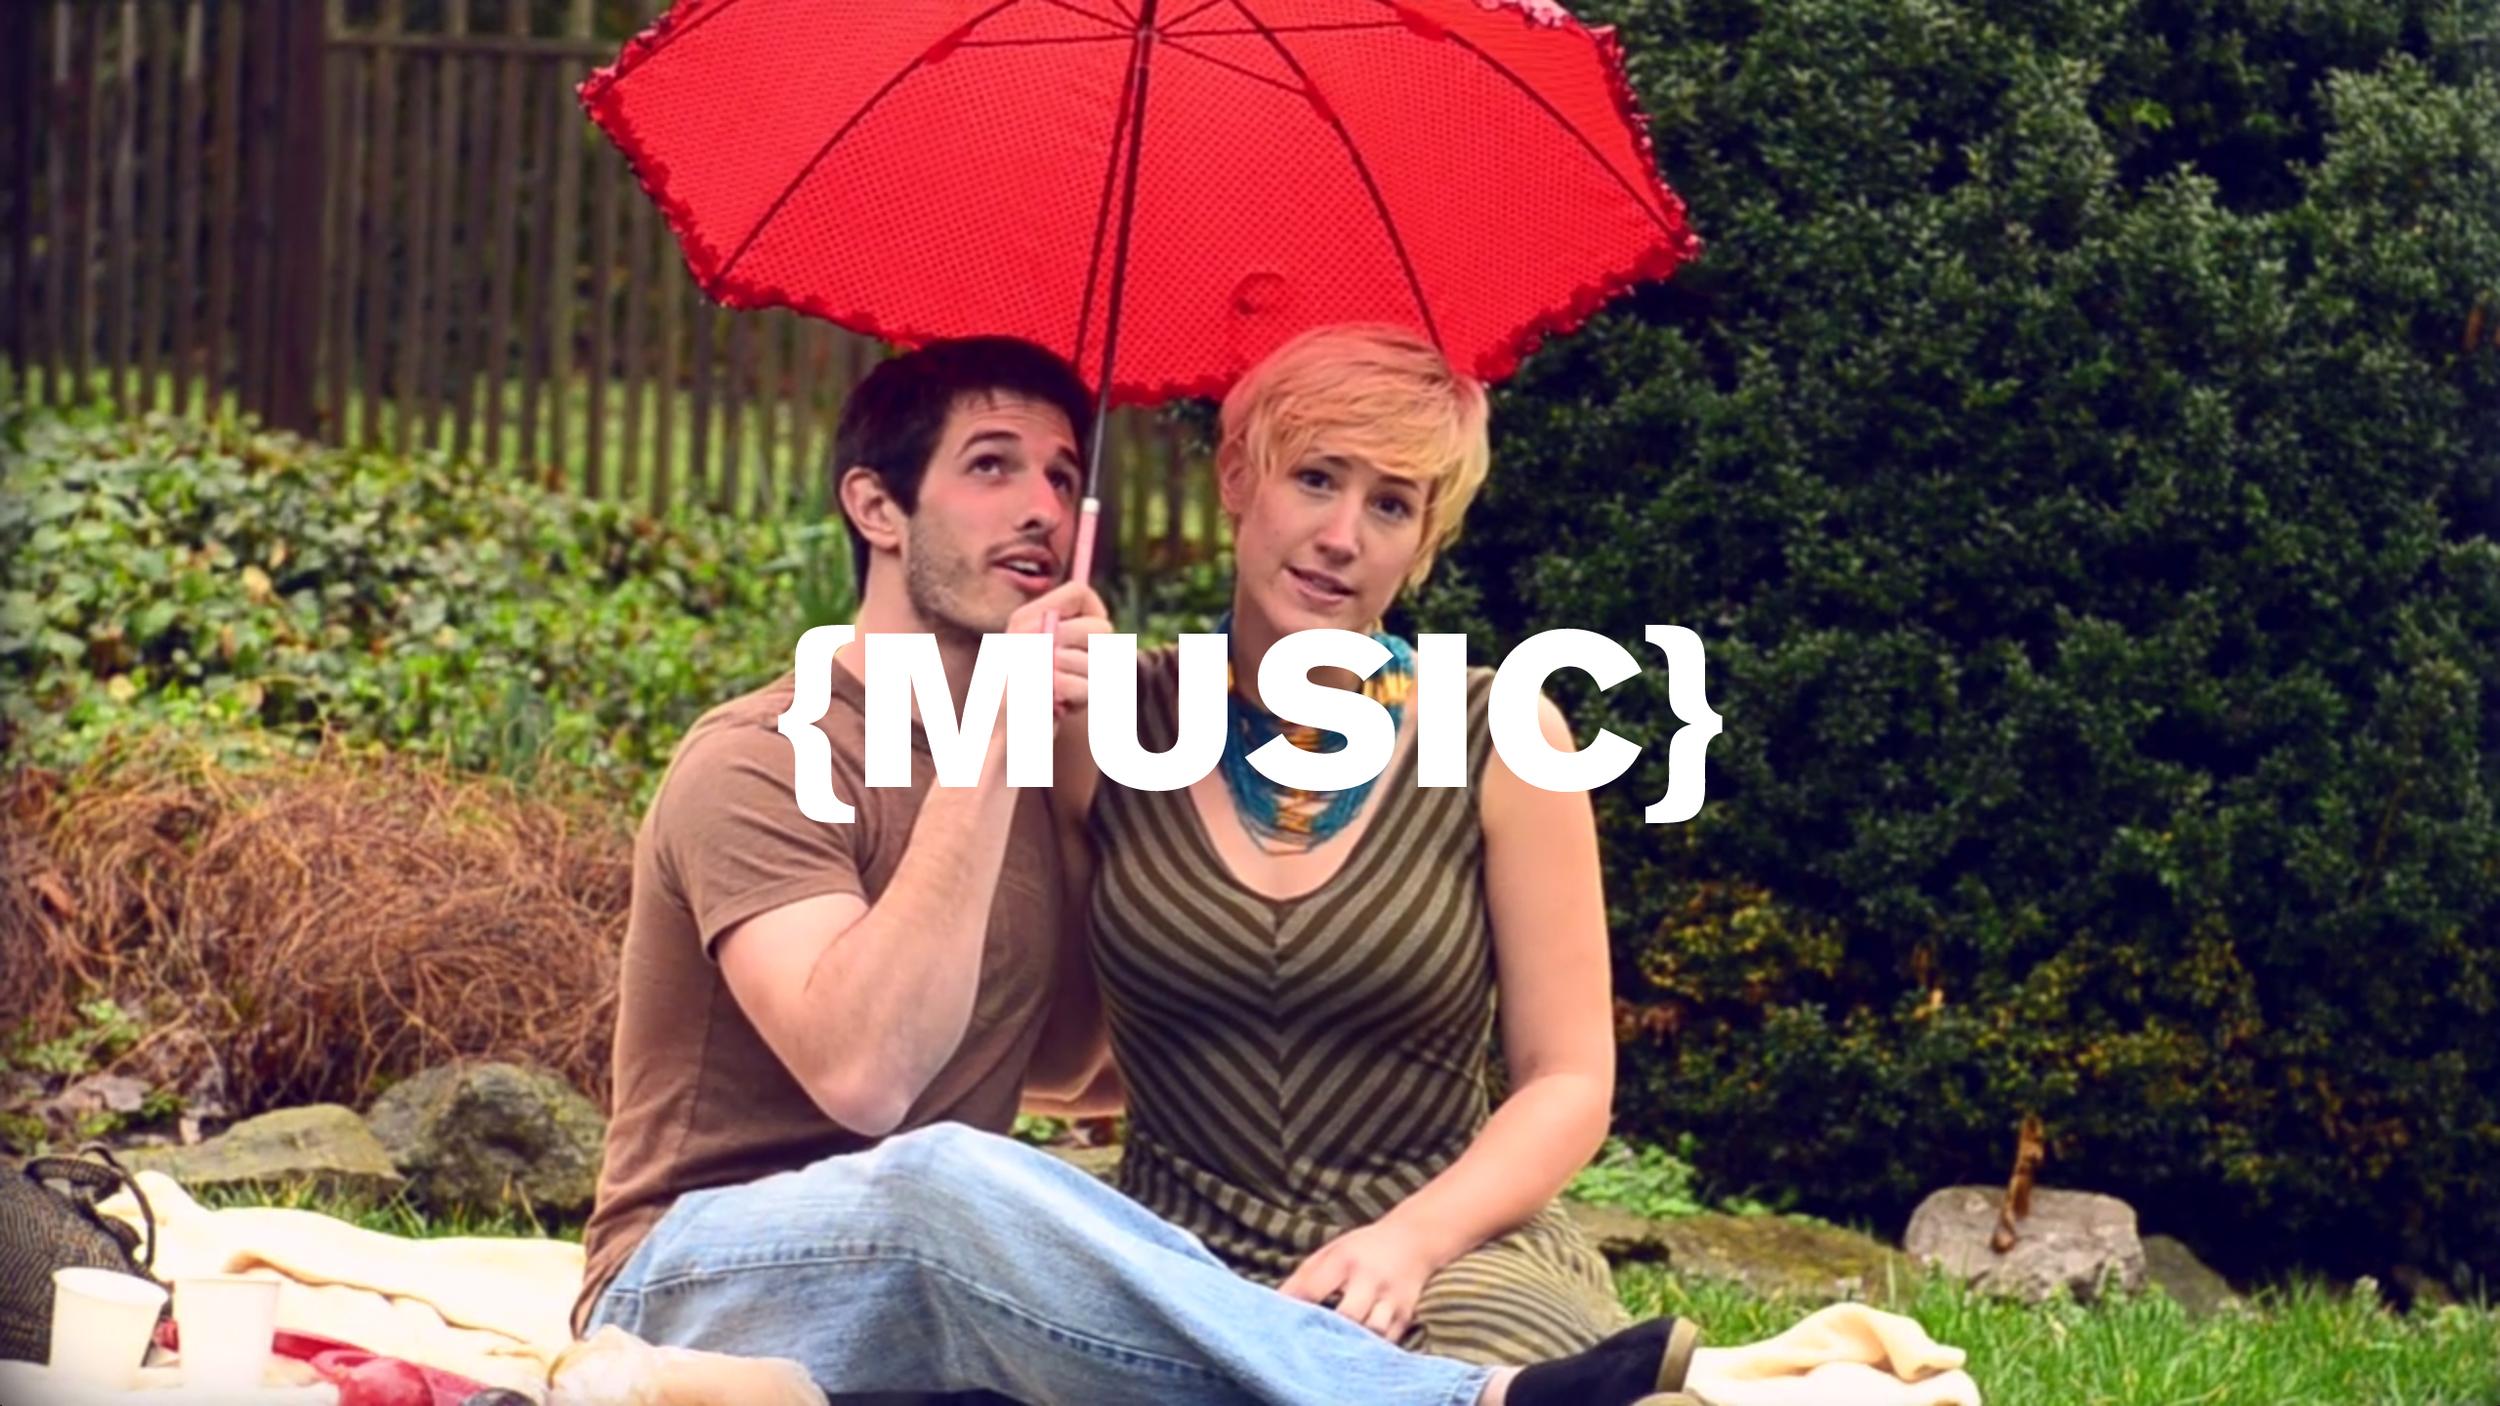 MusicThumb.jpg